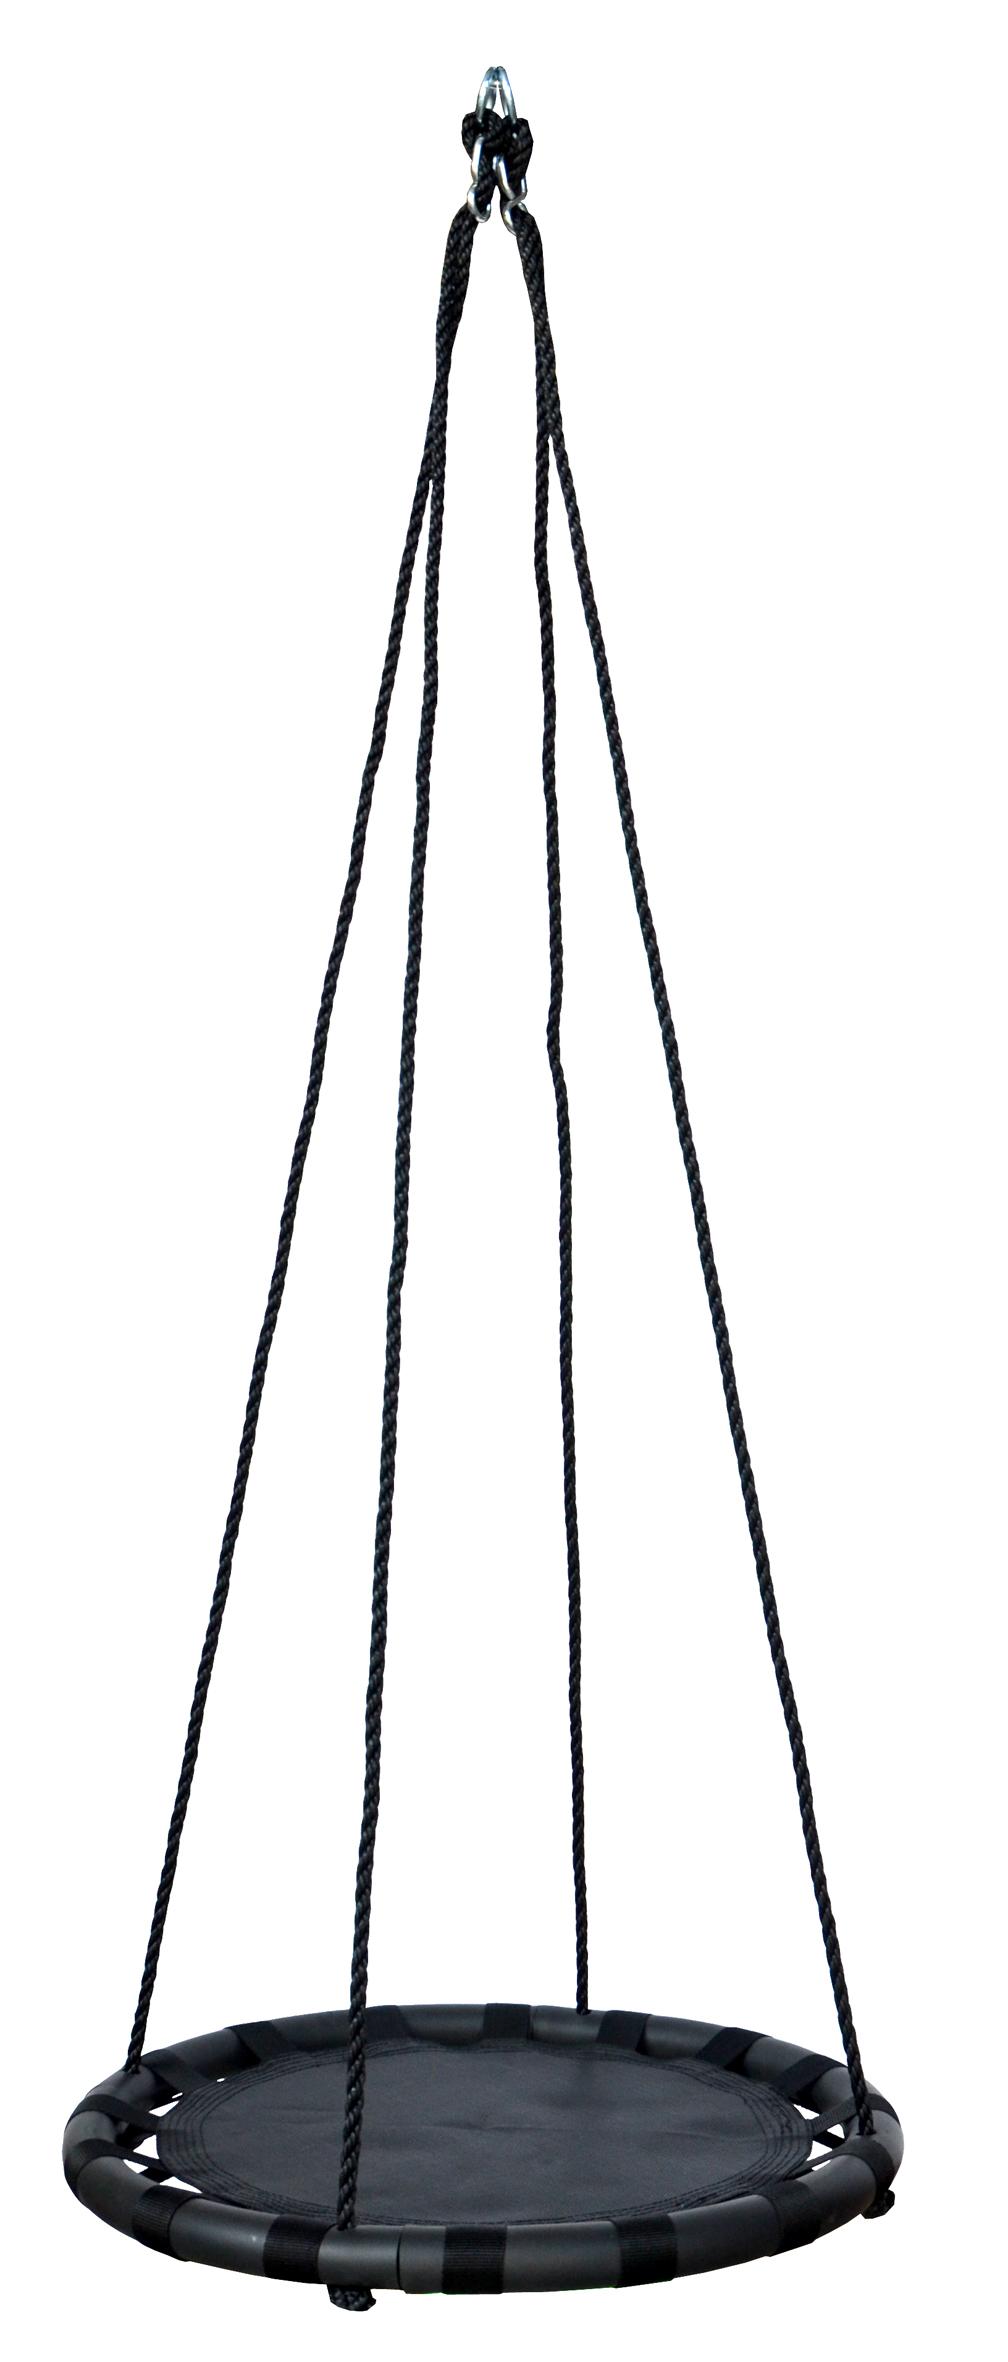 60cm Black Round Mat Nest Swing - Heavenly Hammocks